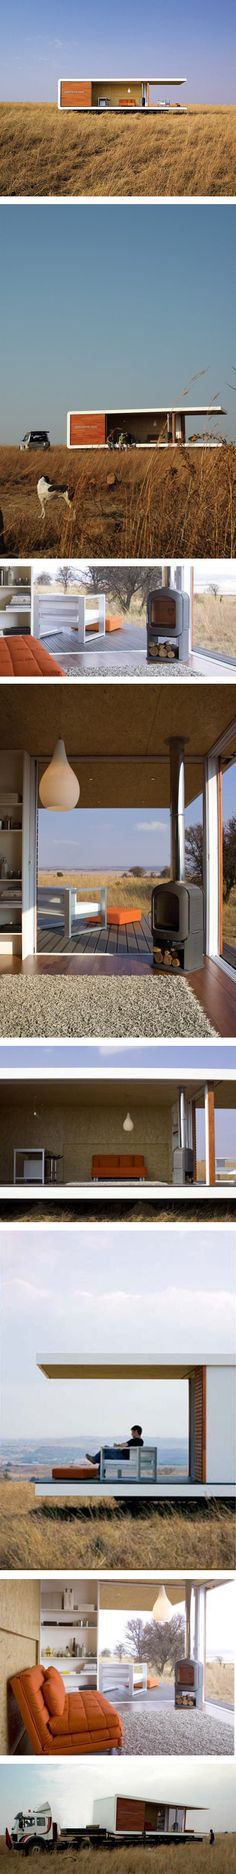 Zenyaka-house  #architecture #design